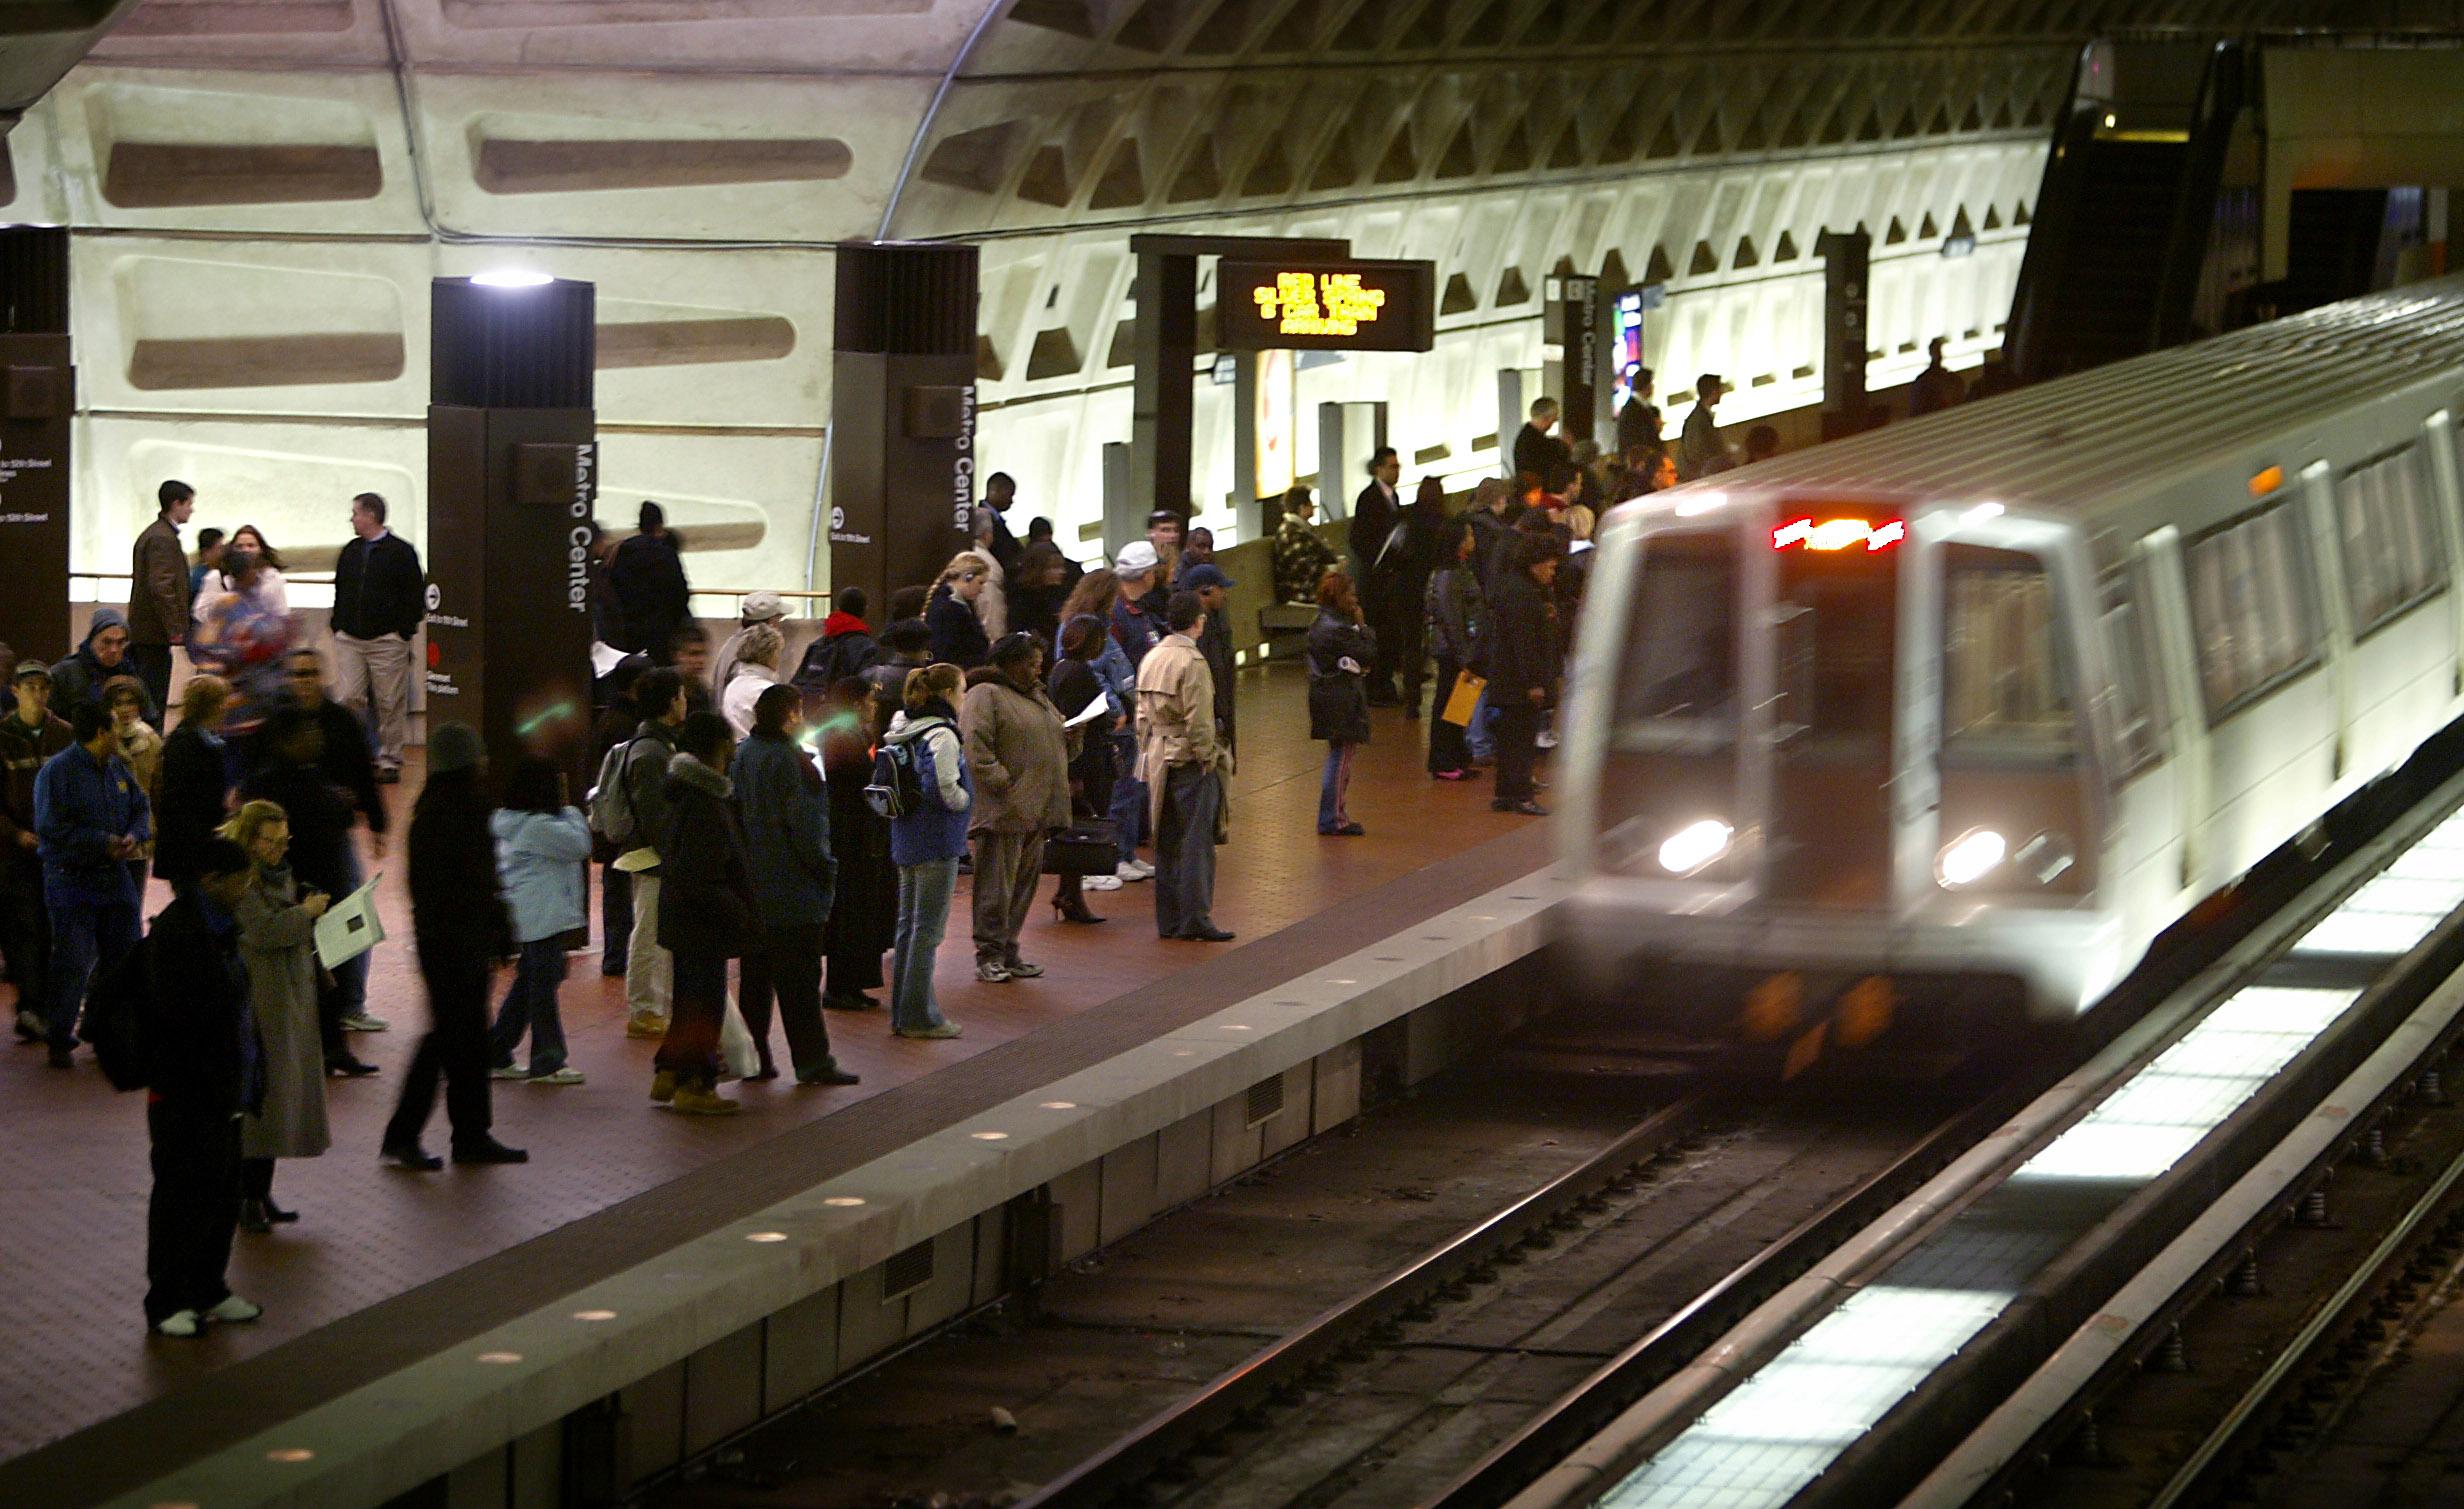 Metro eliminating 500 positions